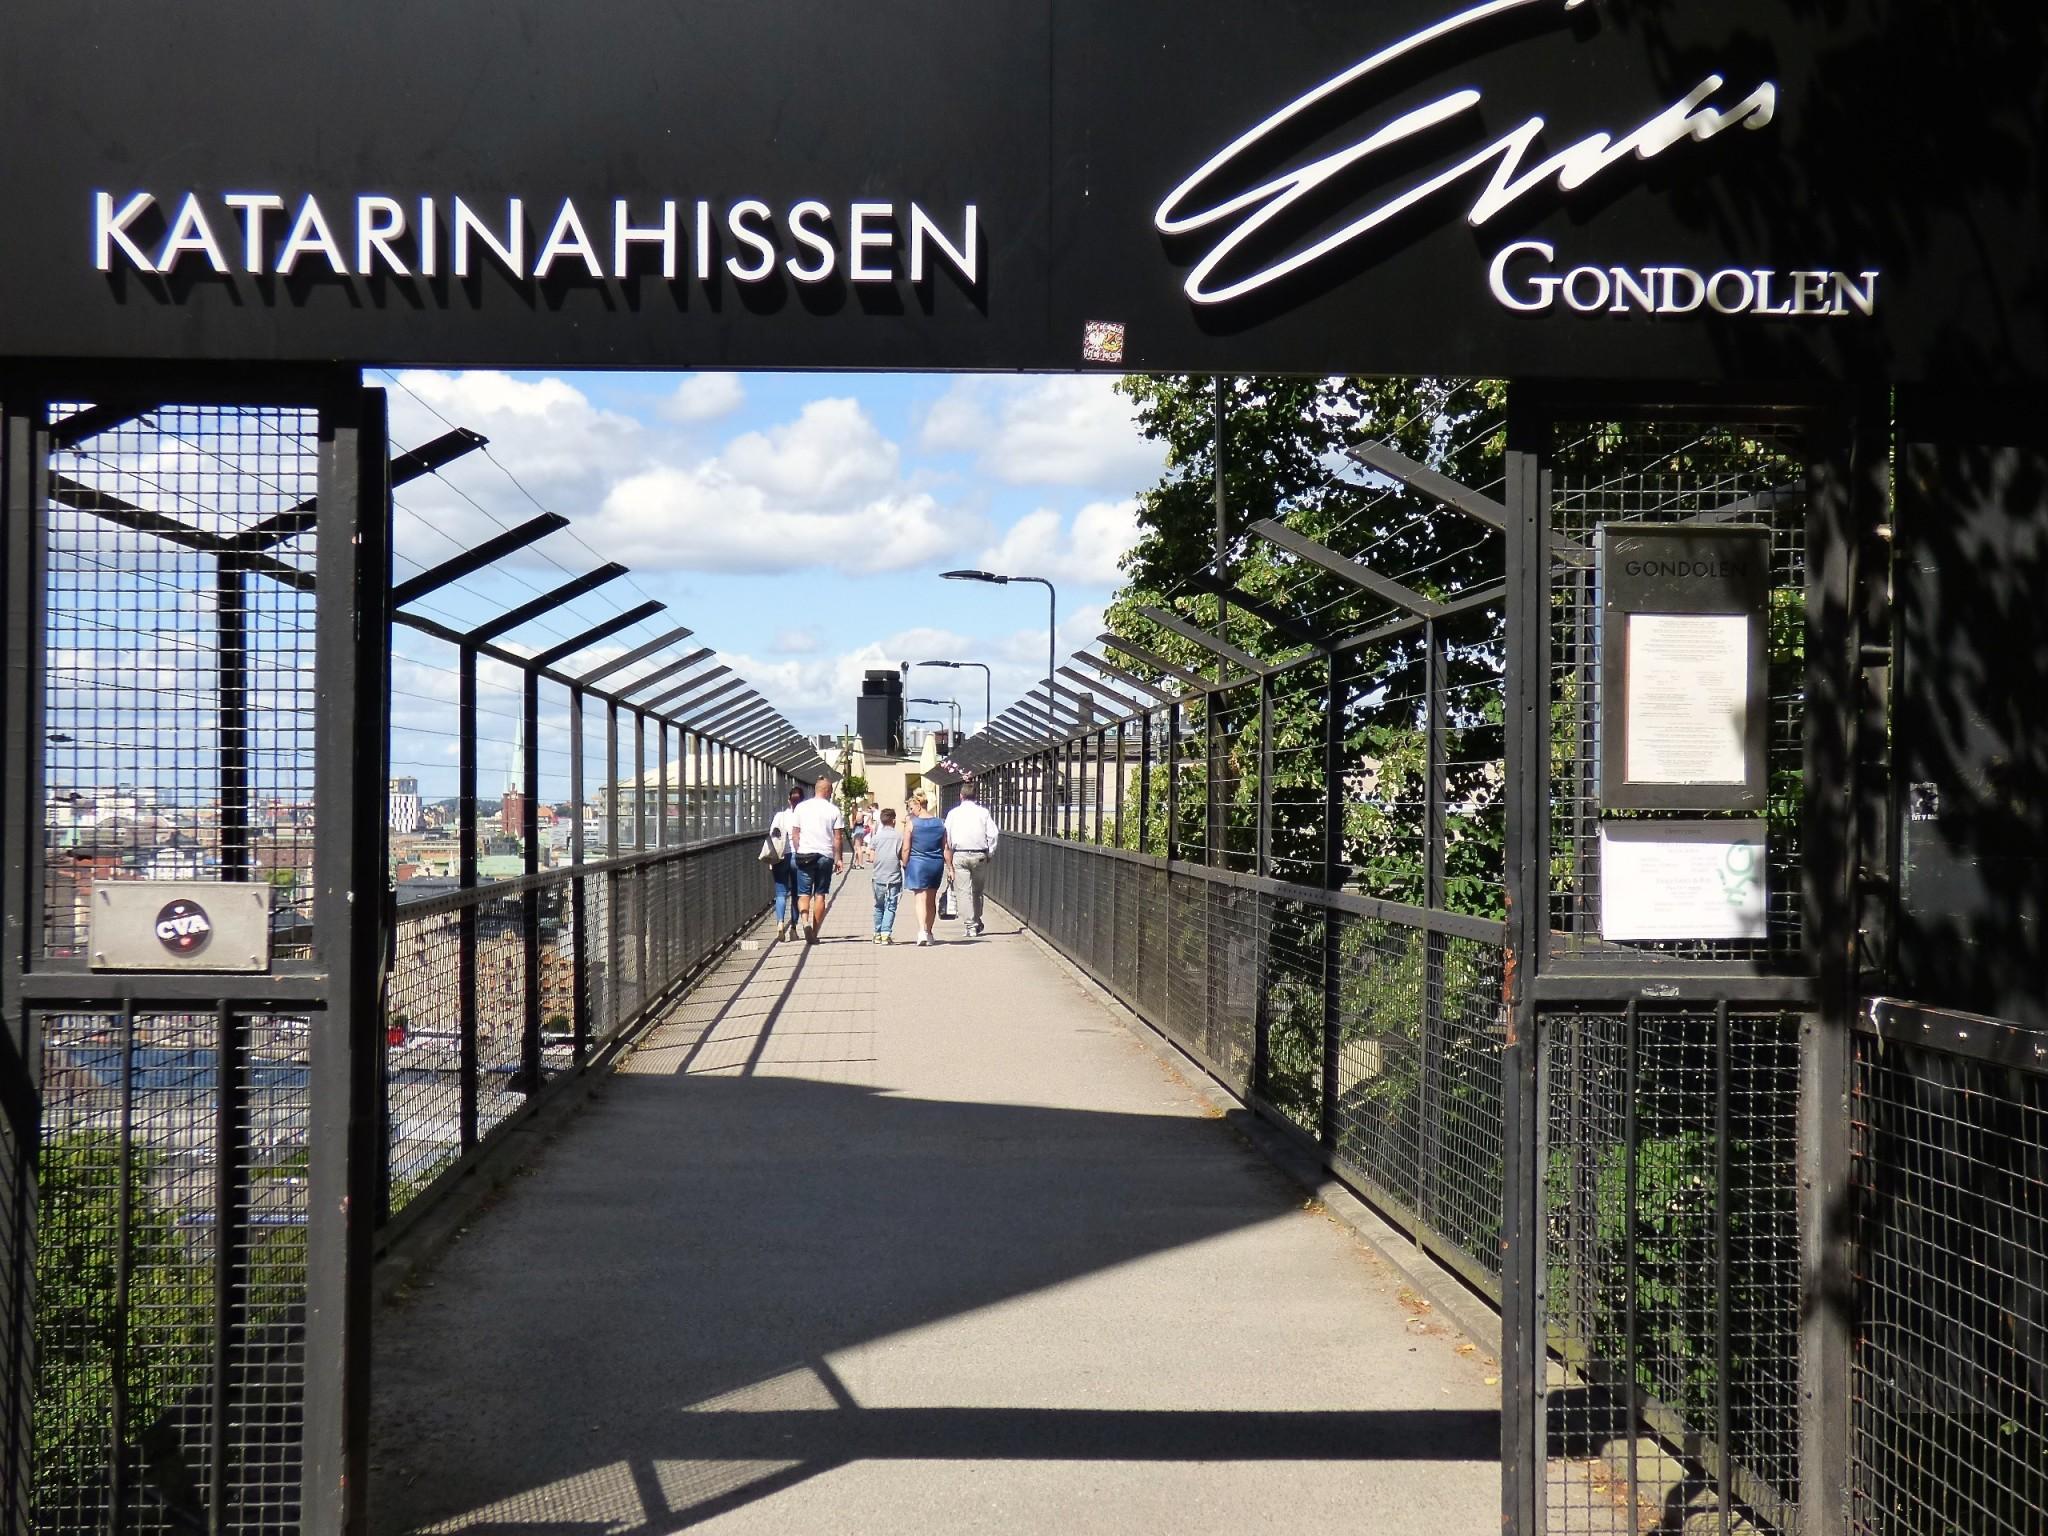 Tukholma Eriks Gondolen